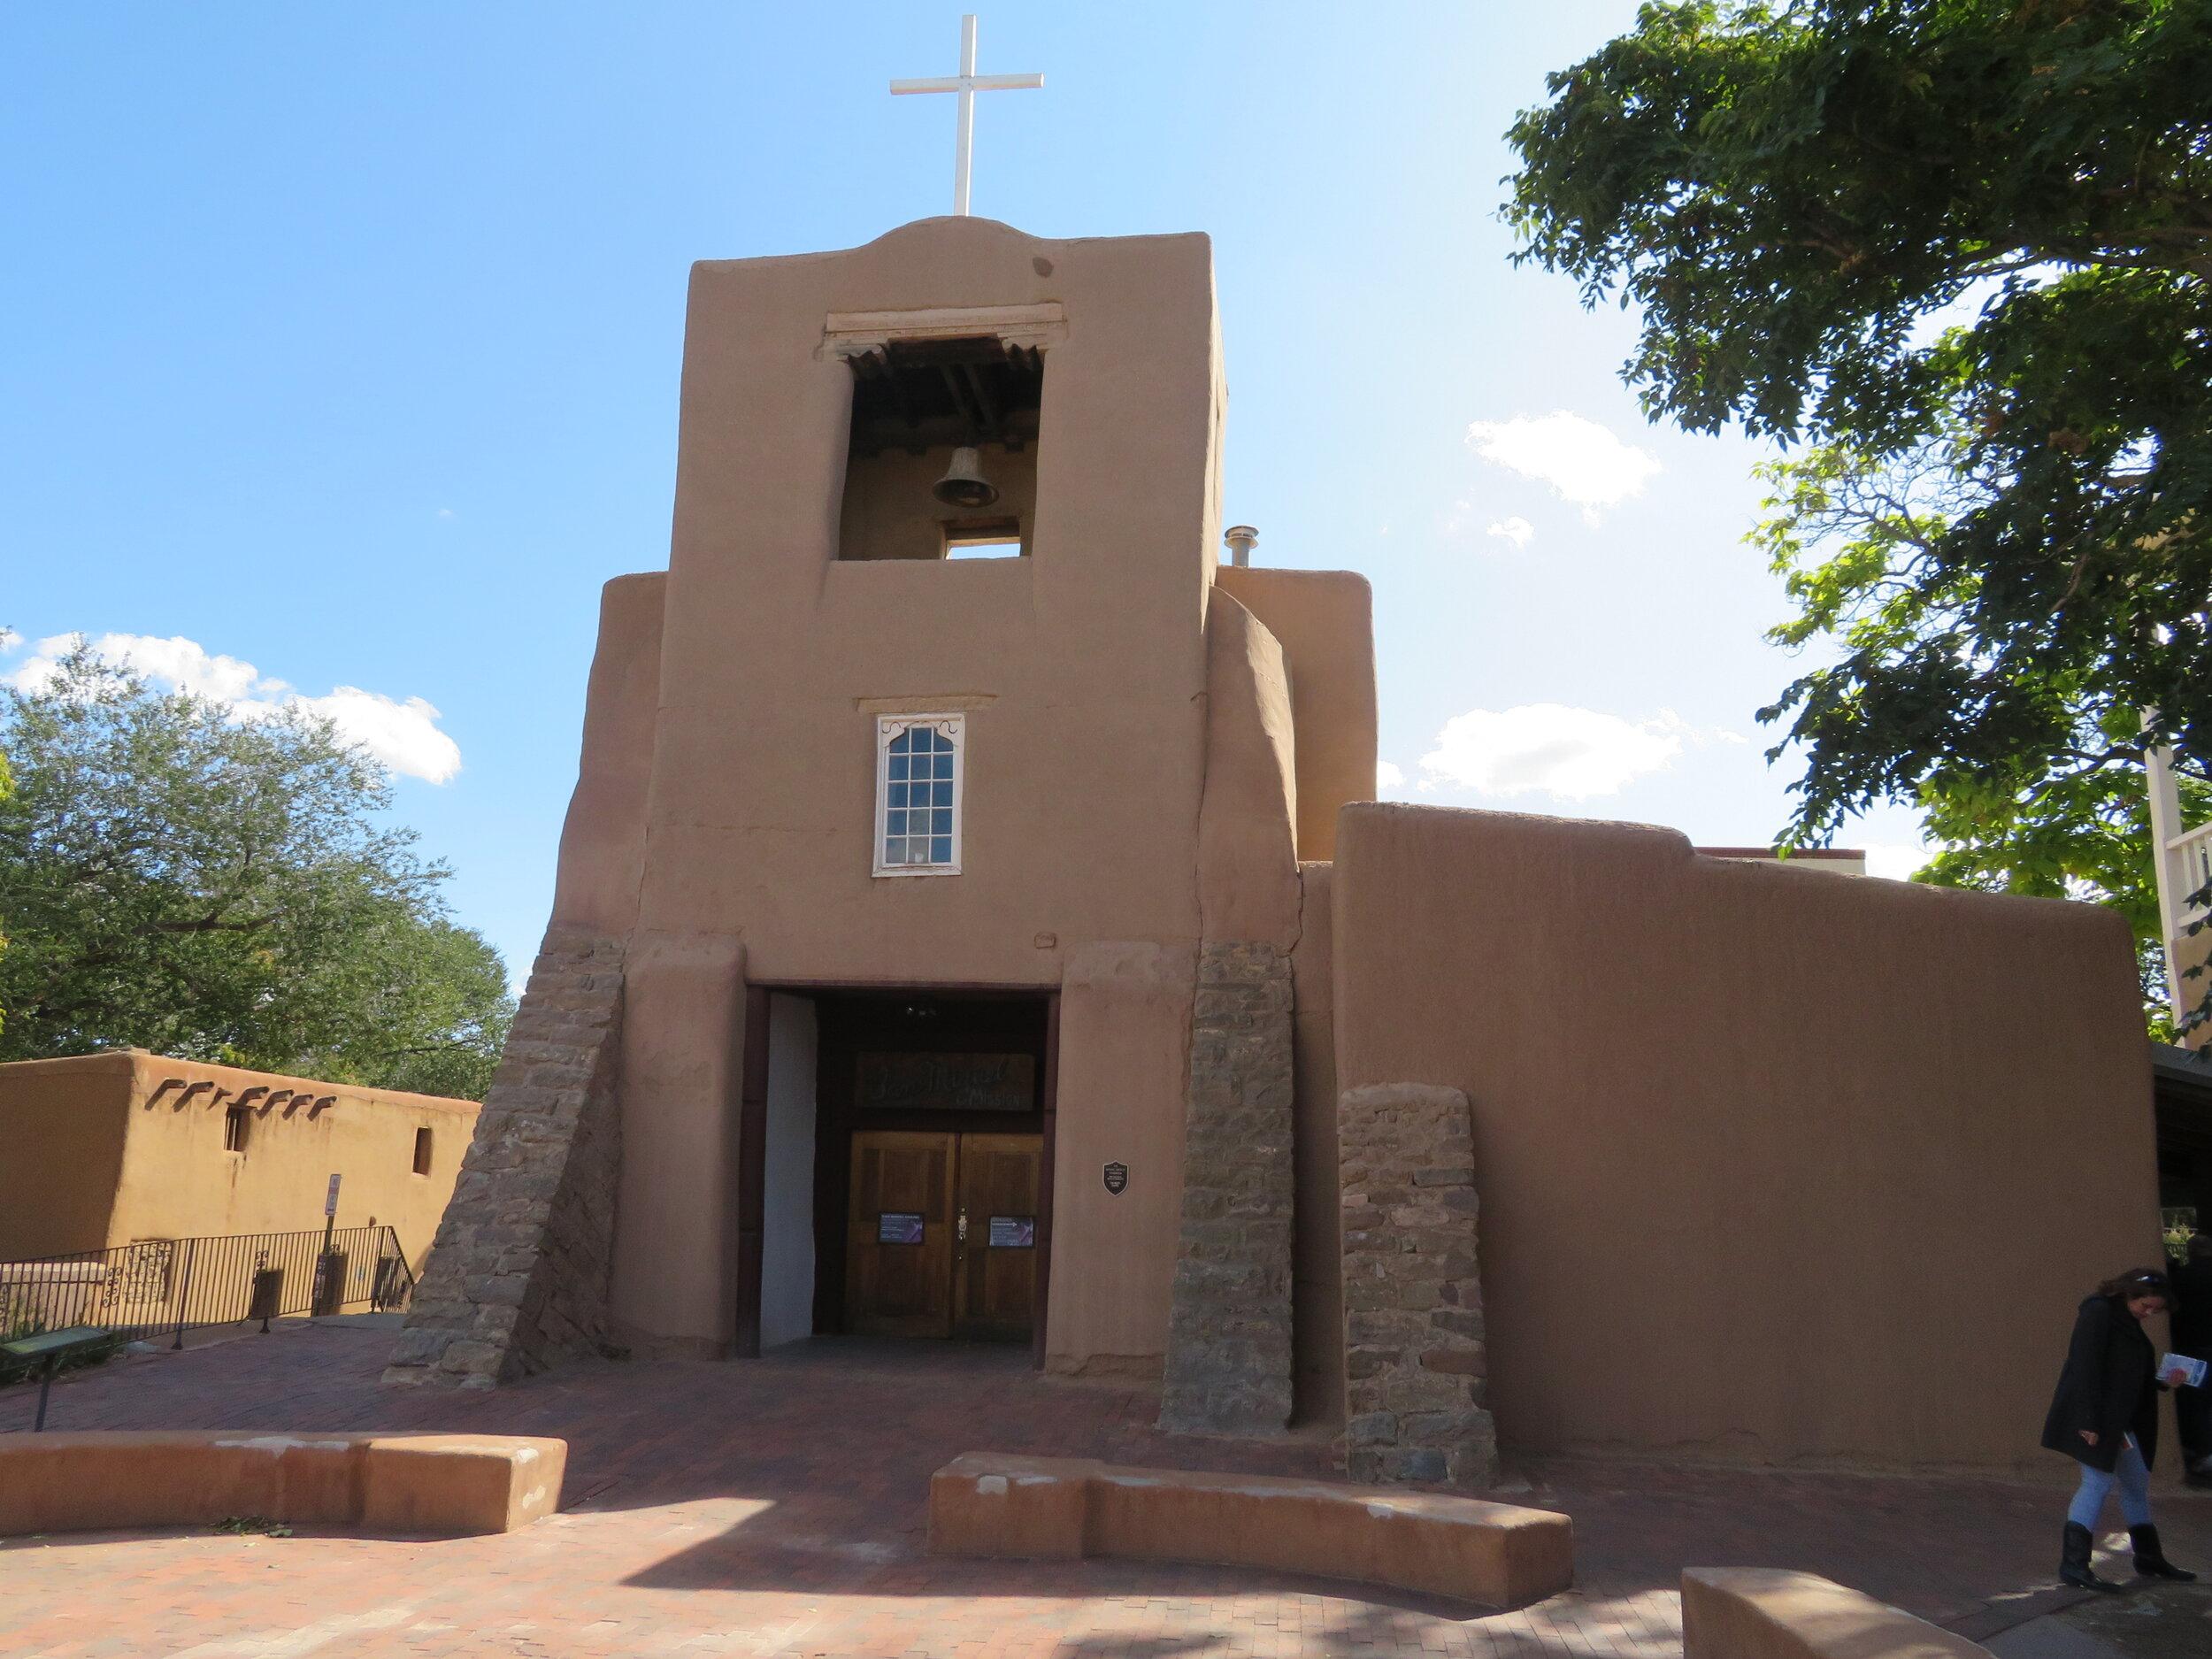 San Miguel, oldest church in Santa Fe